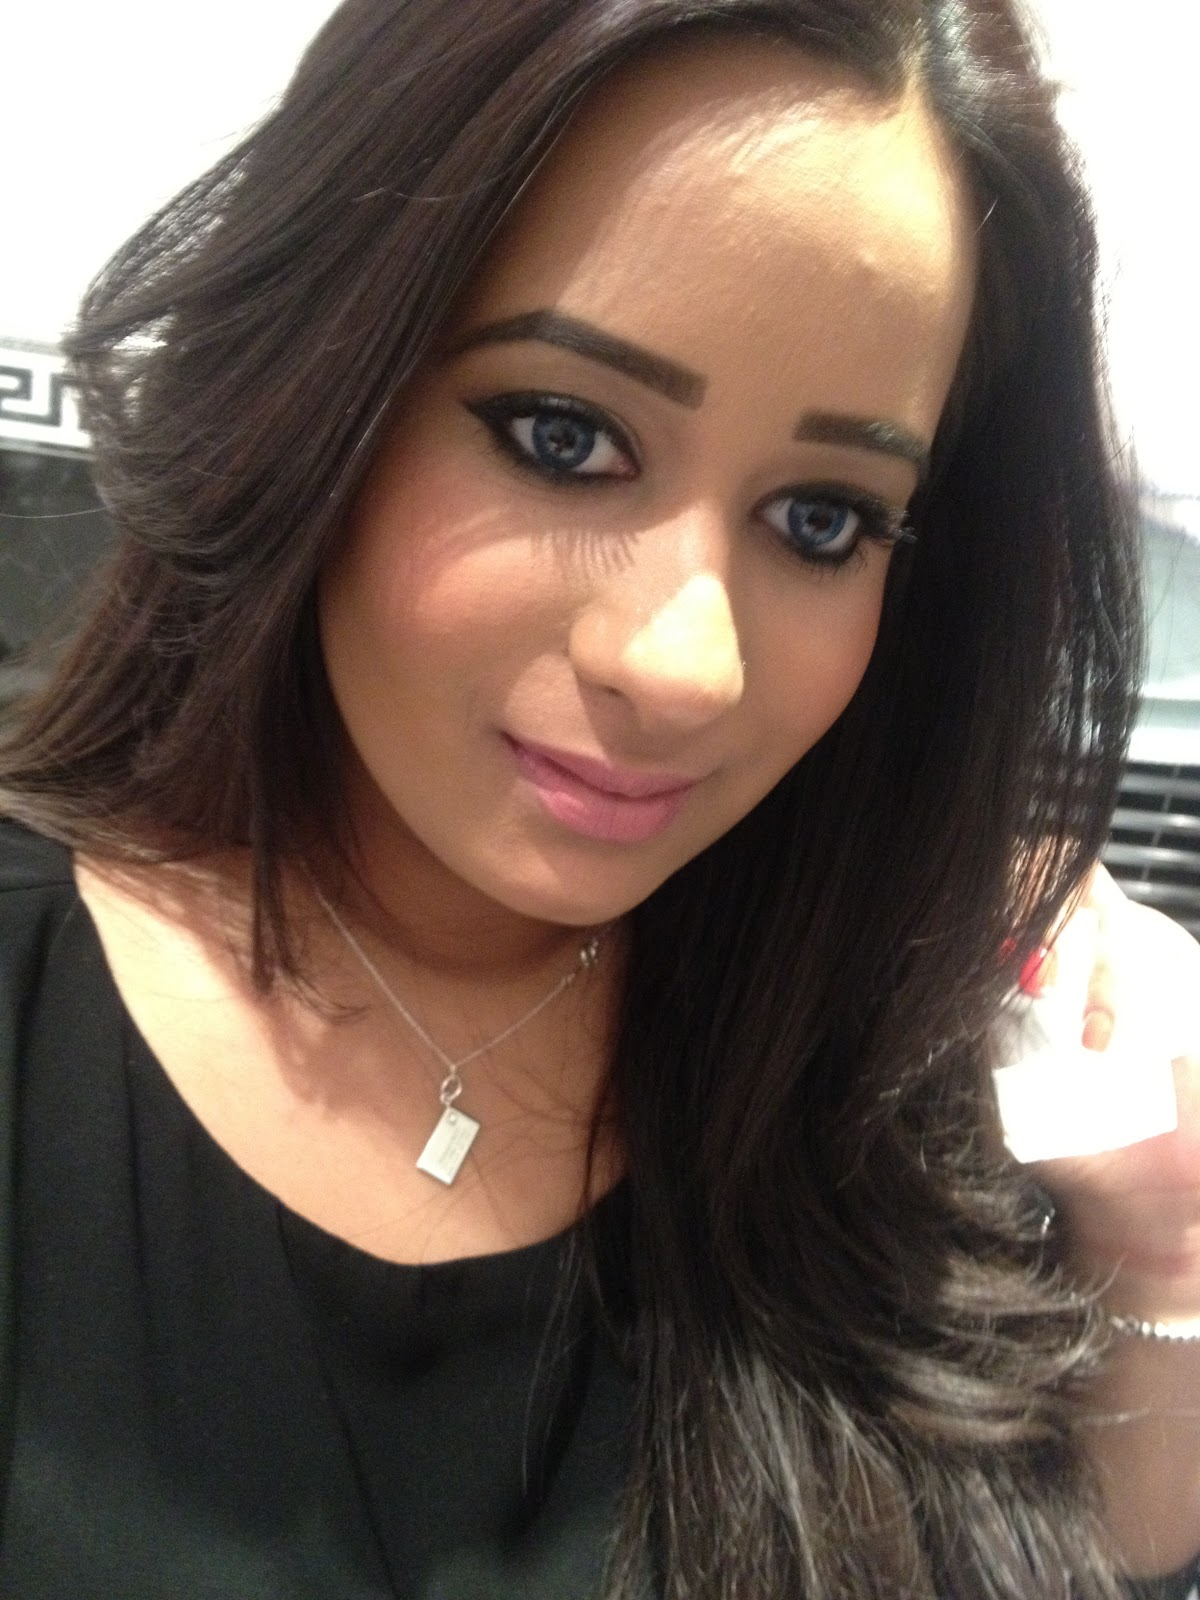 MAC  Yash  Lipstick Middle East Women Eyes